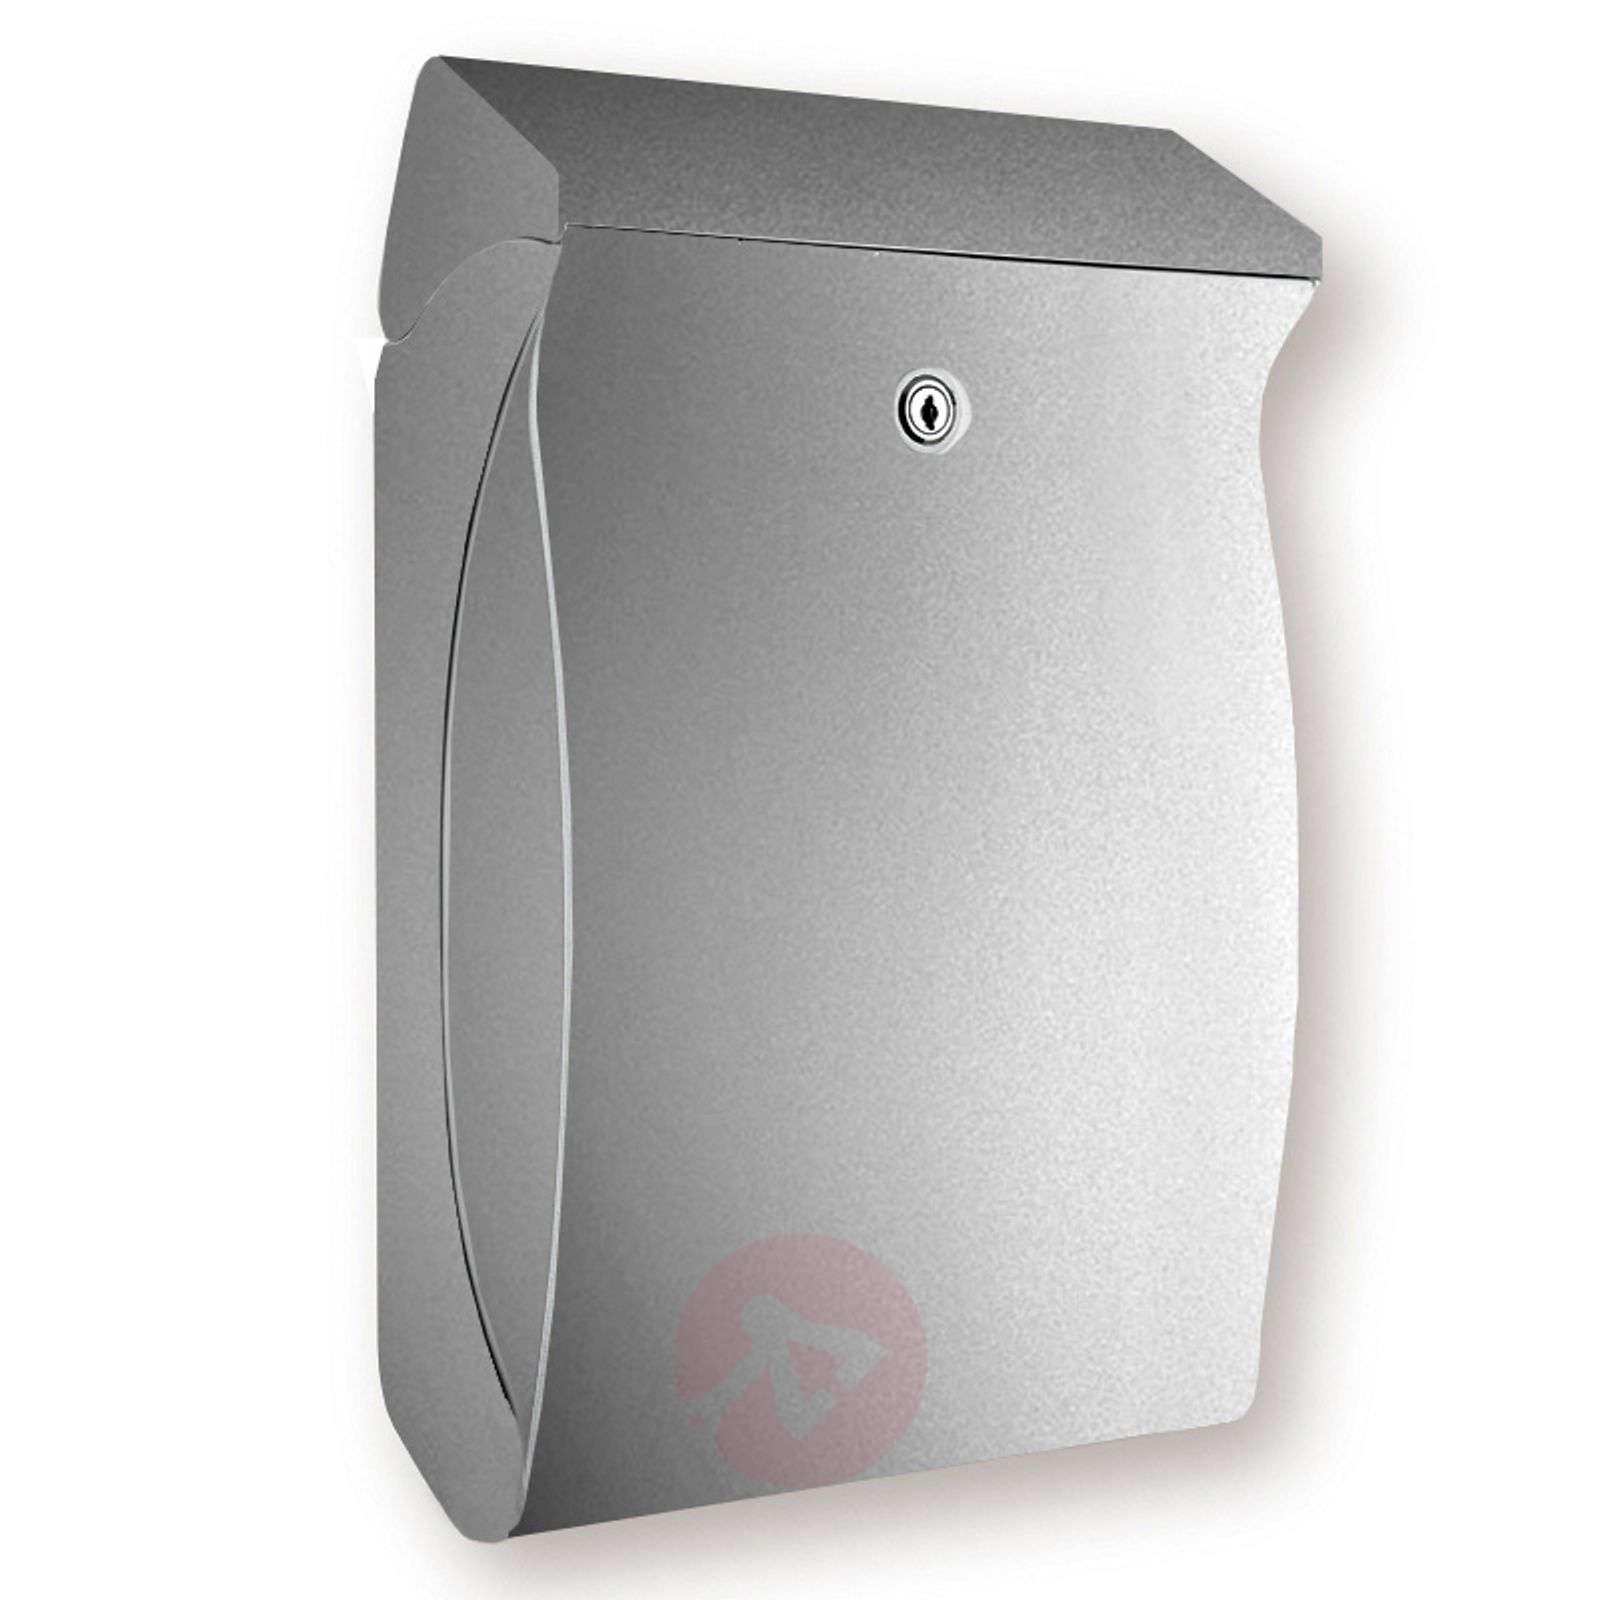 Kompakti muovinen postilaatikko Swing-1532013X-01